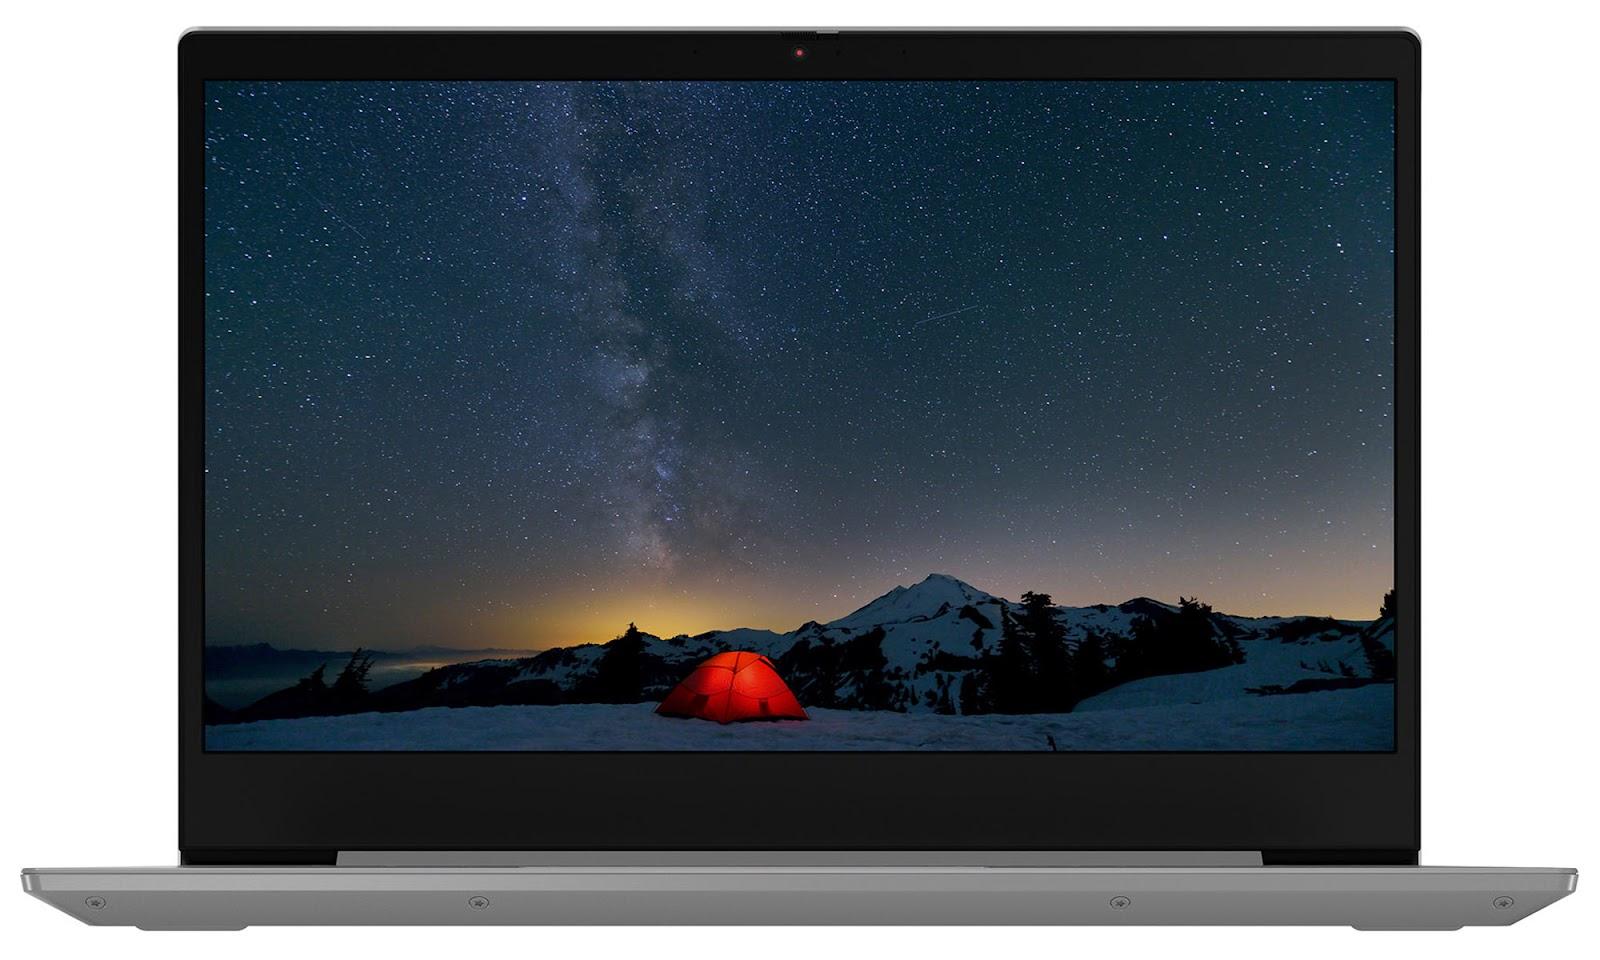 Фото 1. Ноутбук Lenovo ThinkBook 14 IIL (20SL00F2RU)